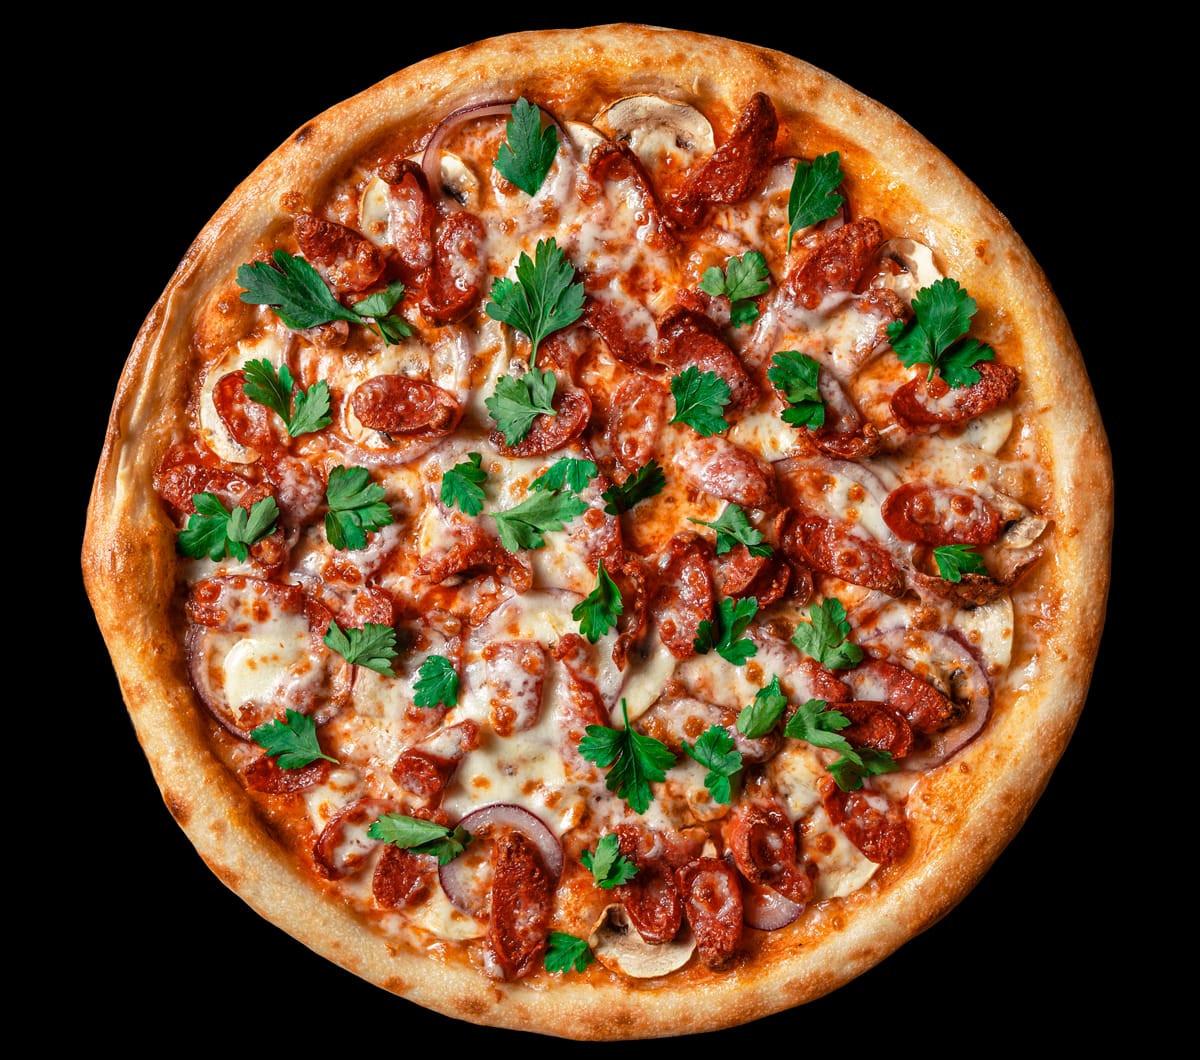 заказать: Пицца - Бавария